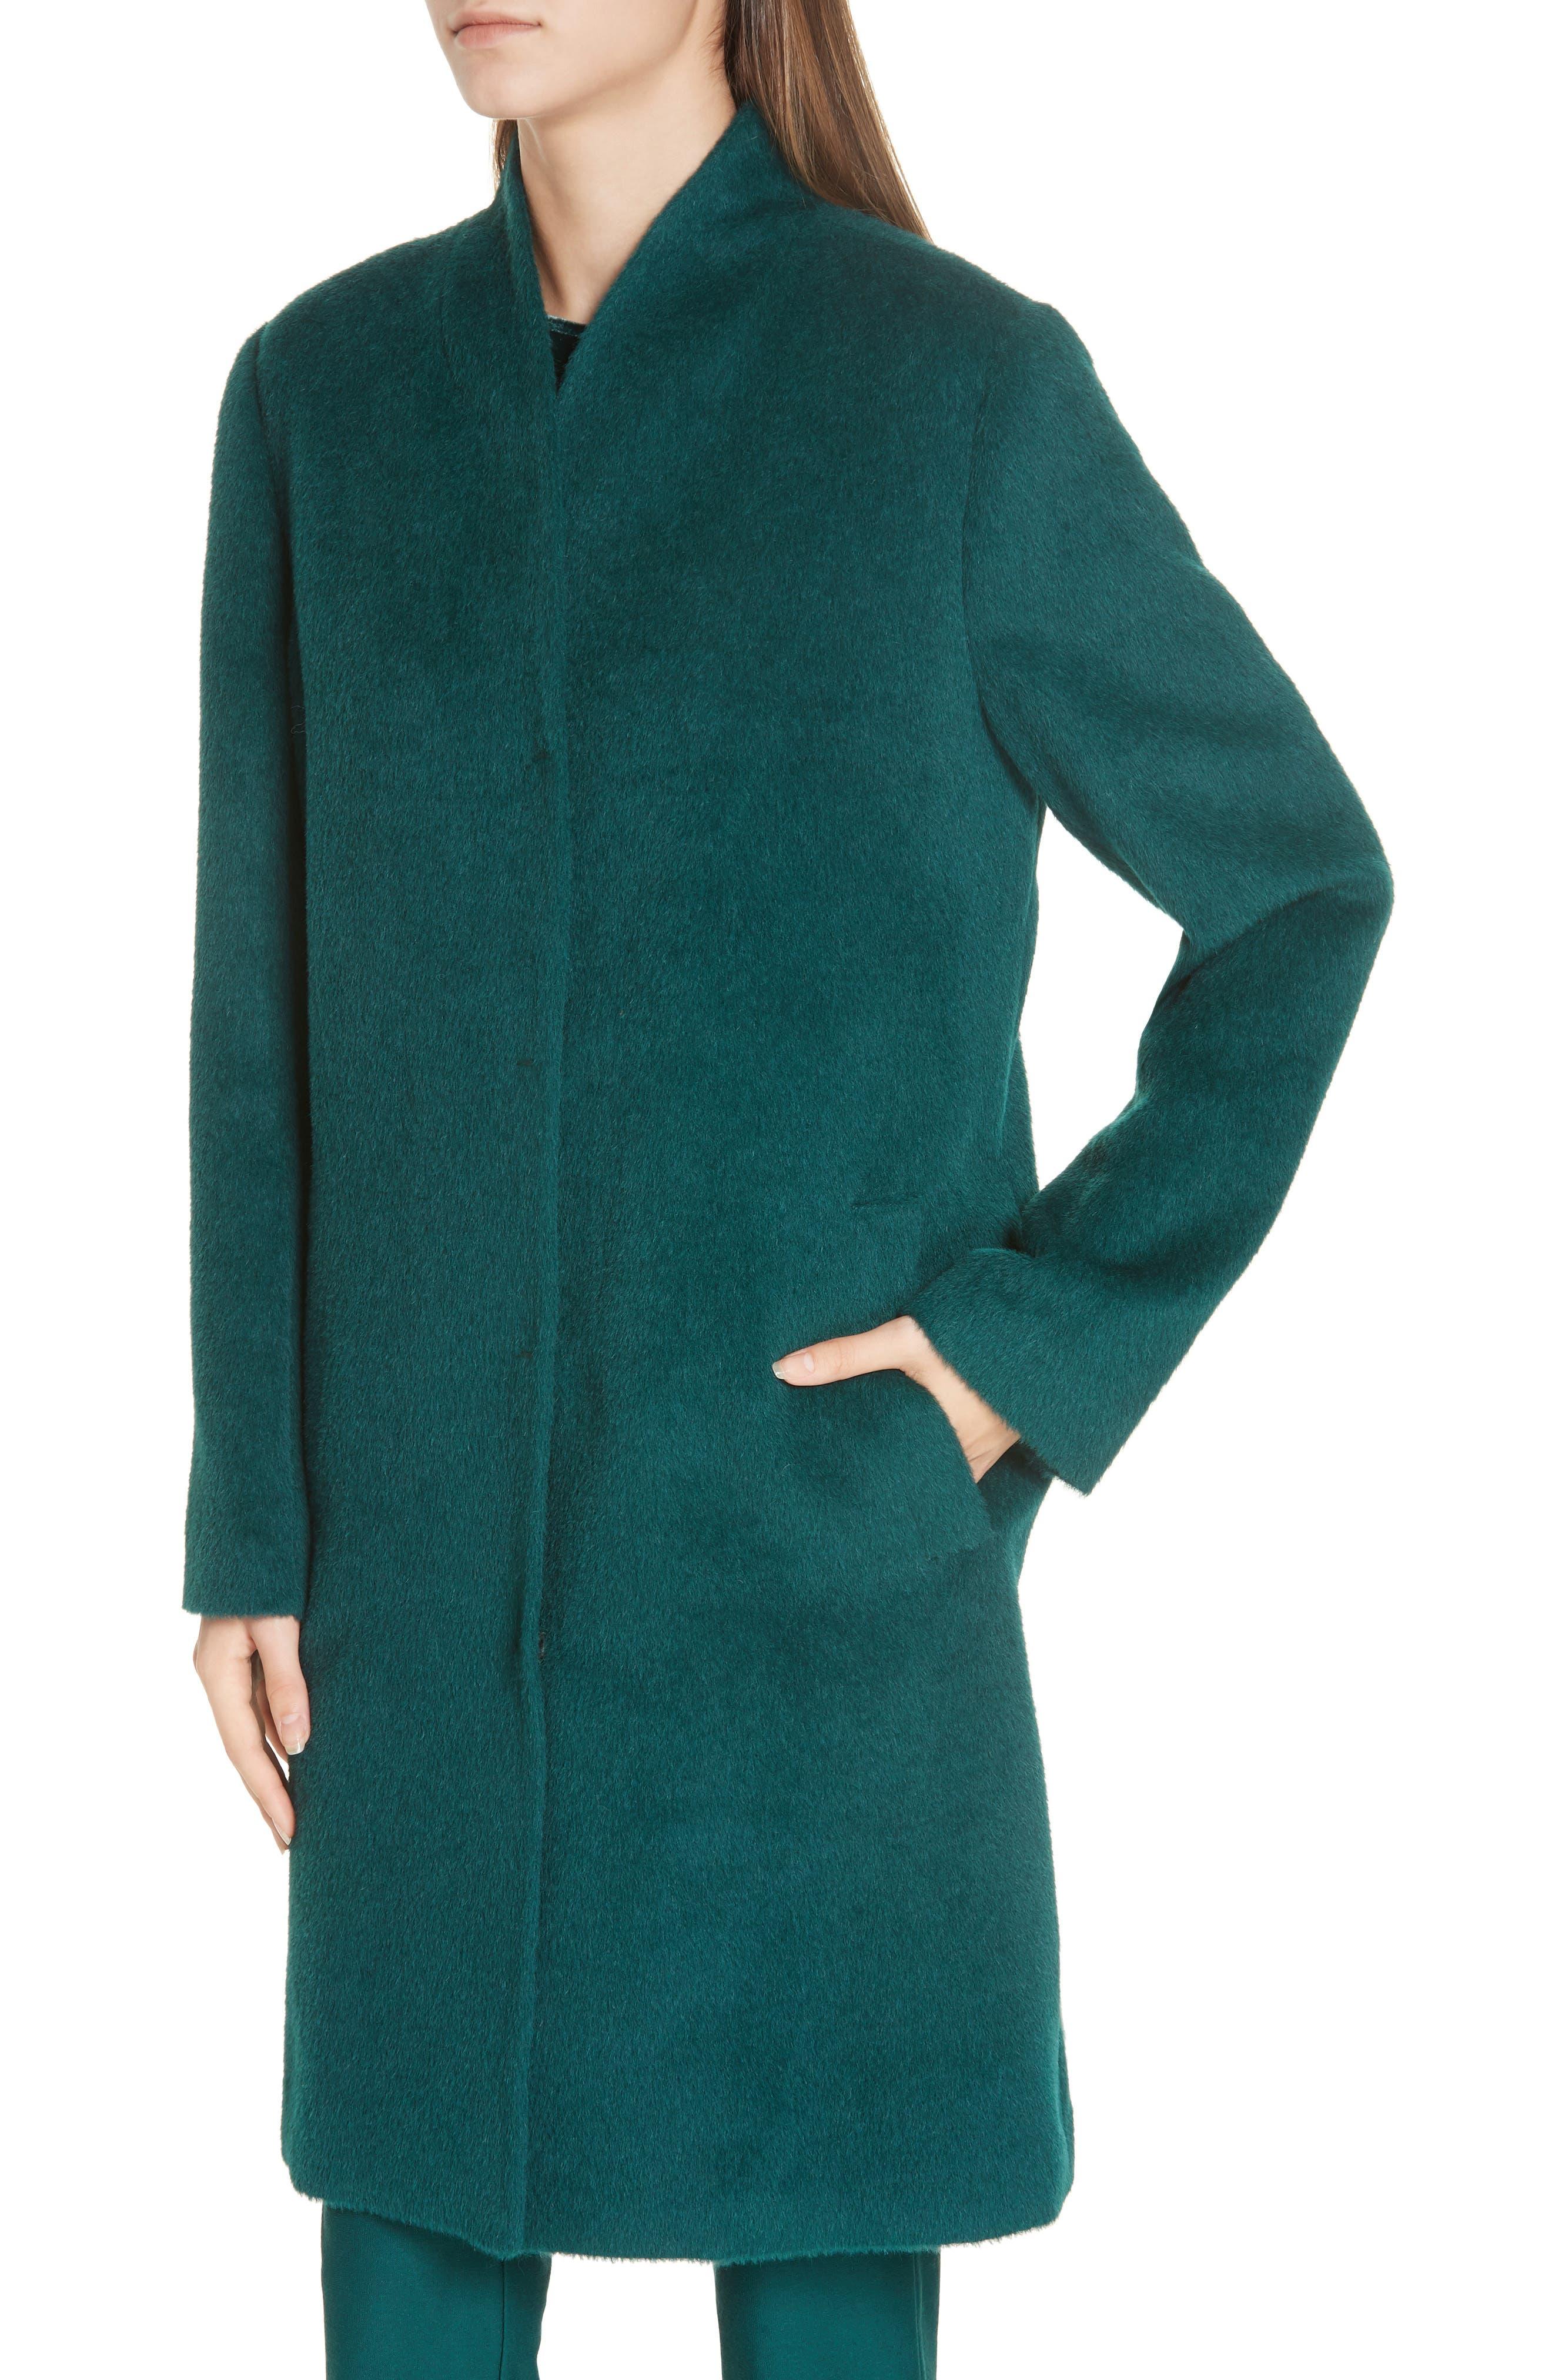 Suri Alpaca Blend Coat,                             Alternate thumbnail 4, color,                             PINE